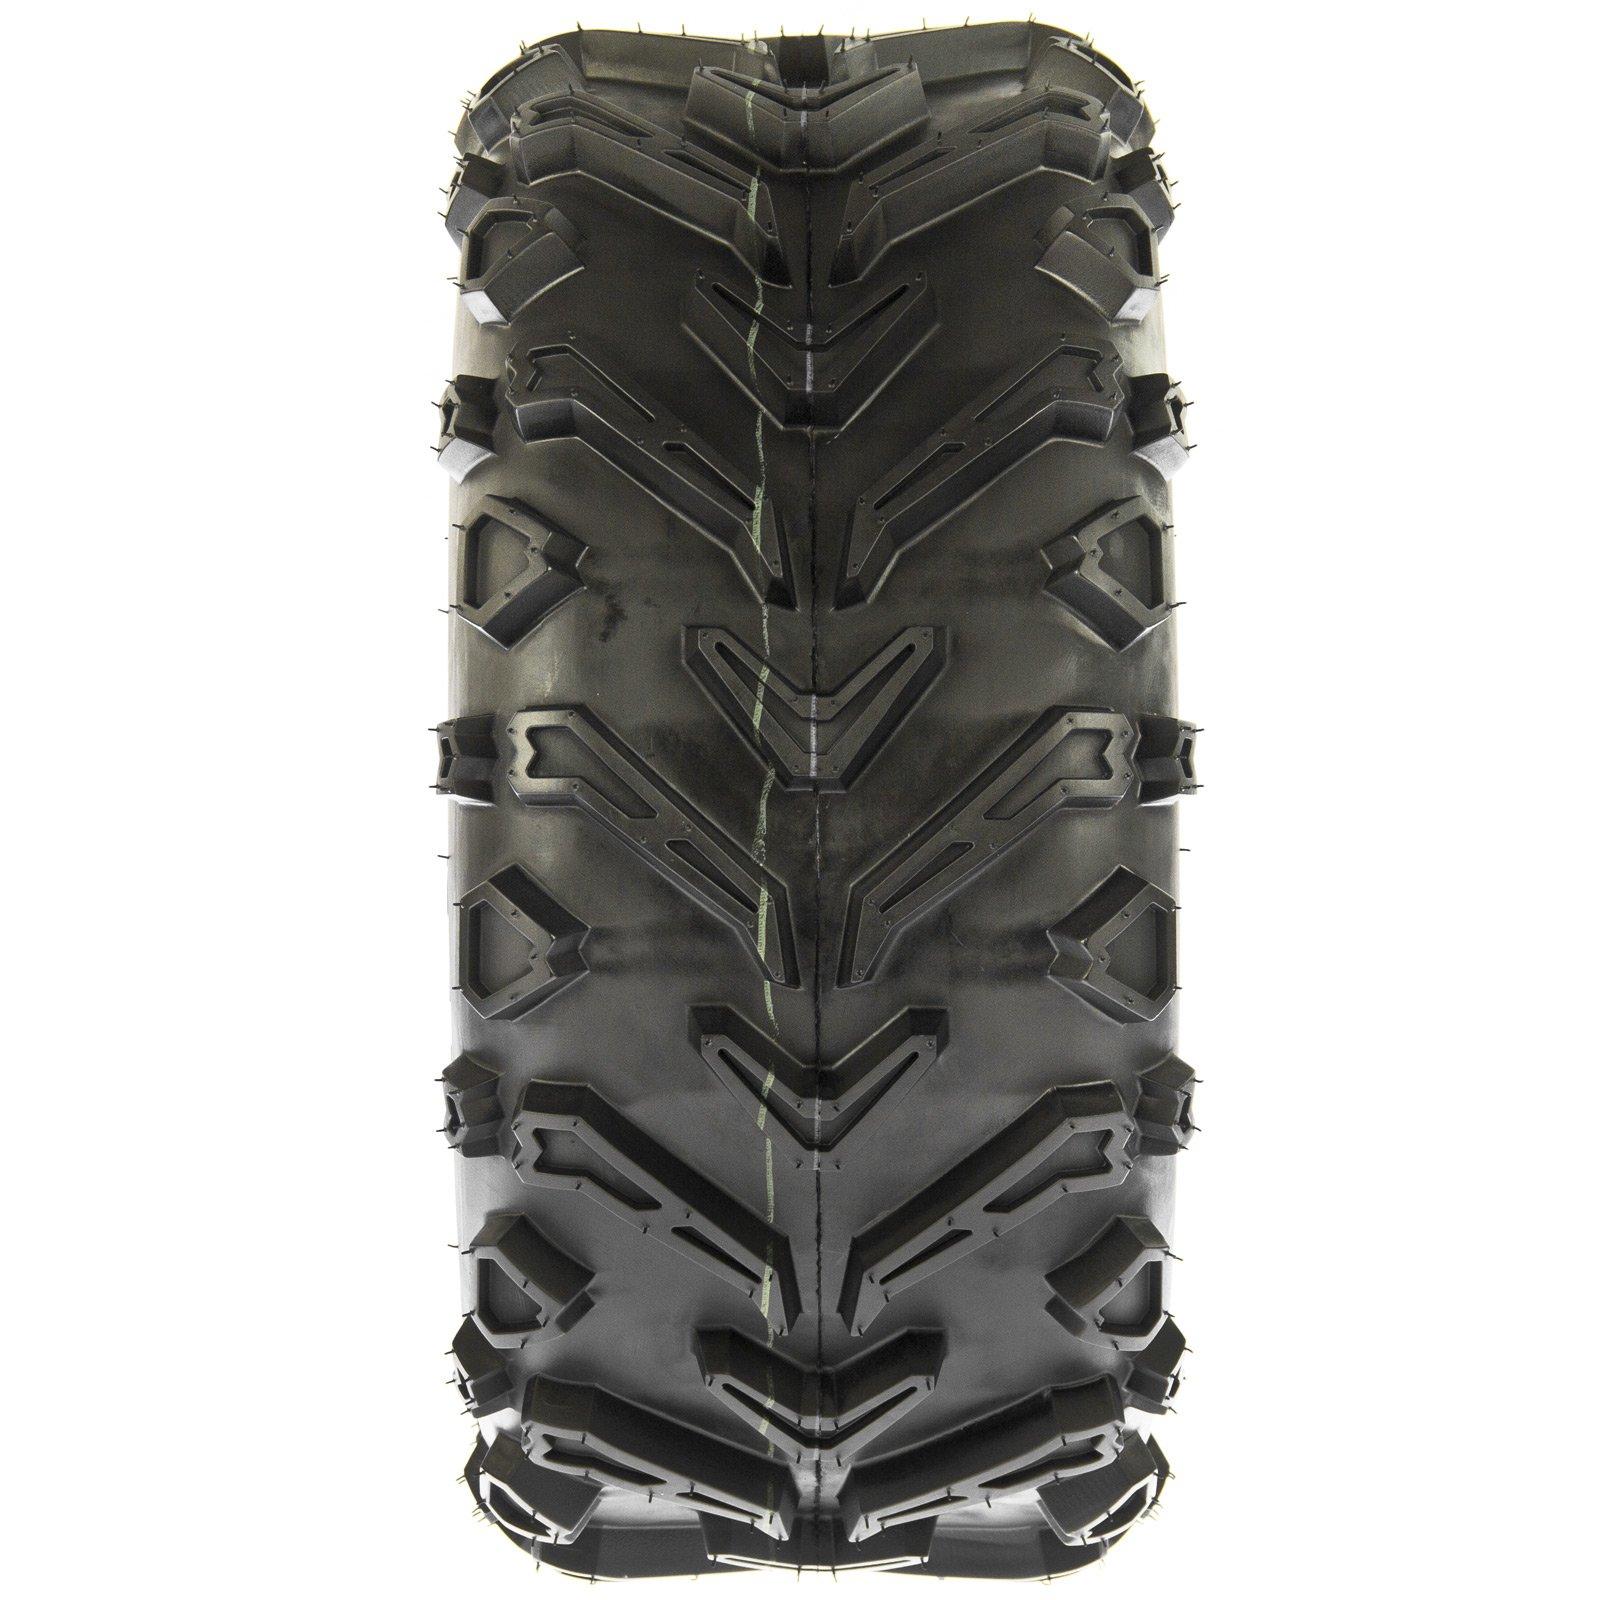 SunF All Trail & Mud ATV UTV Tires 24x8-12 24x10-11 6 PR A041 (Complete Full Set of 4) by SunF (Image #8)